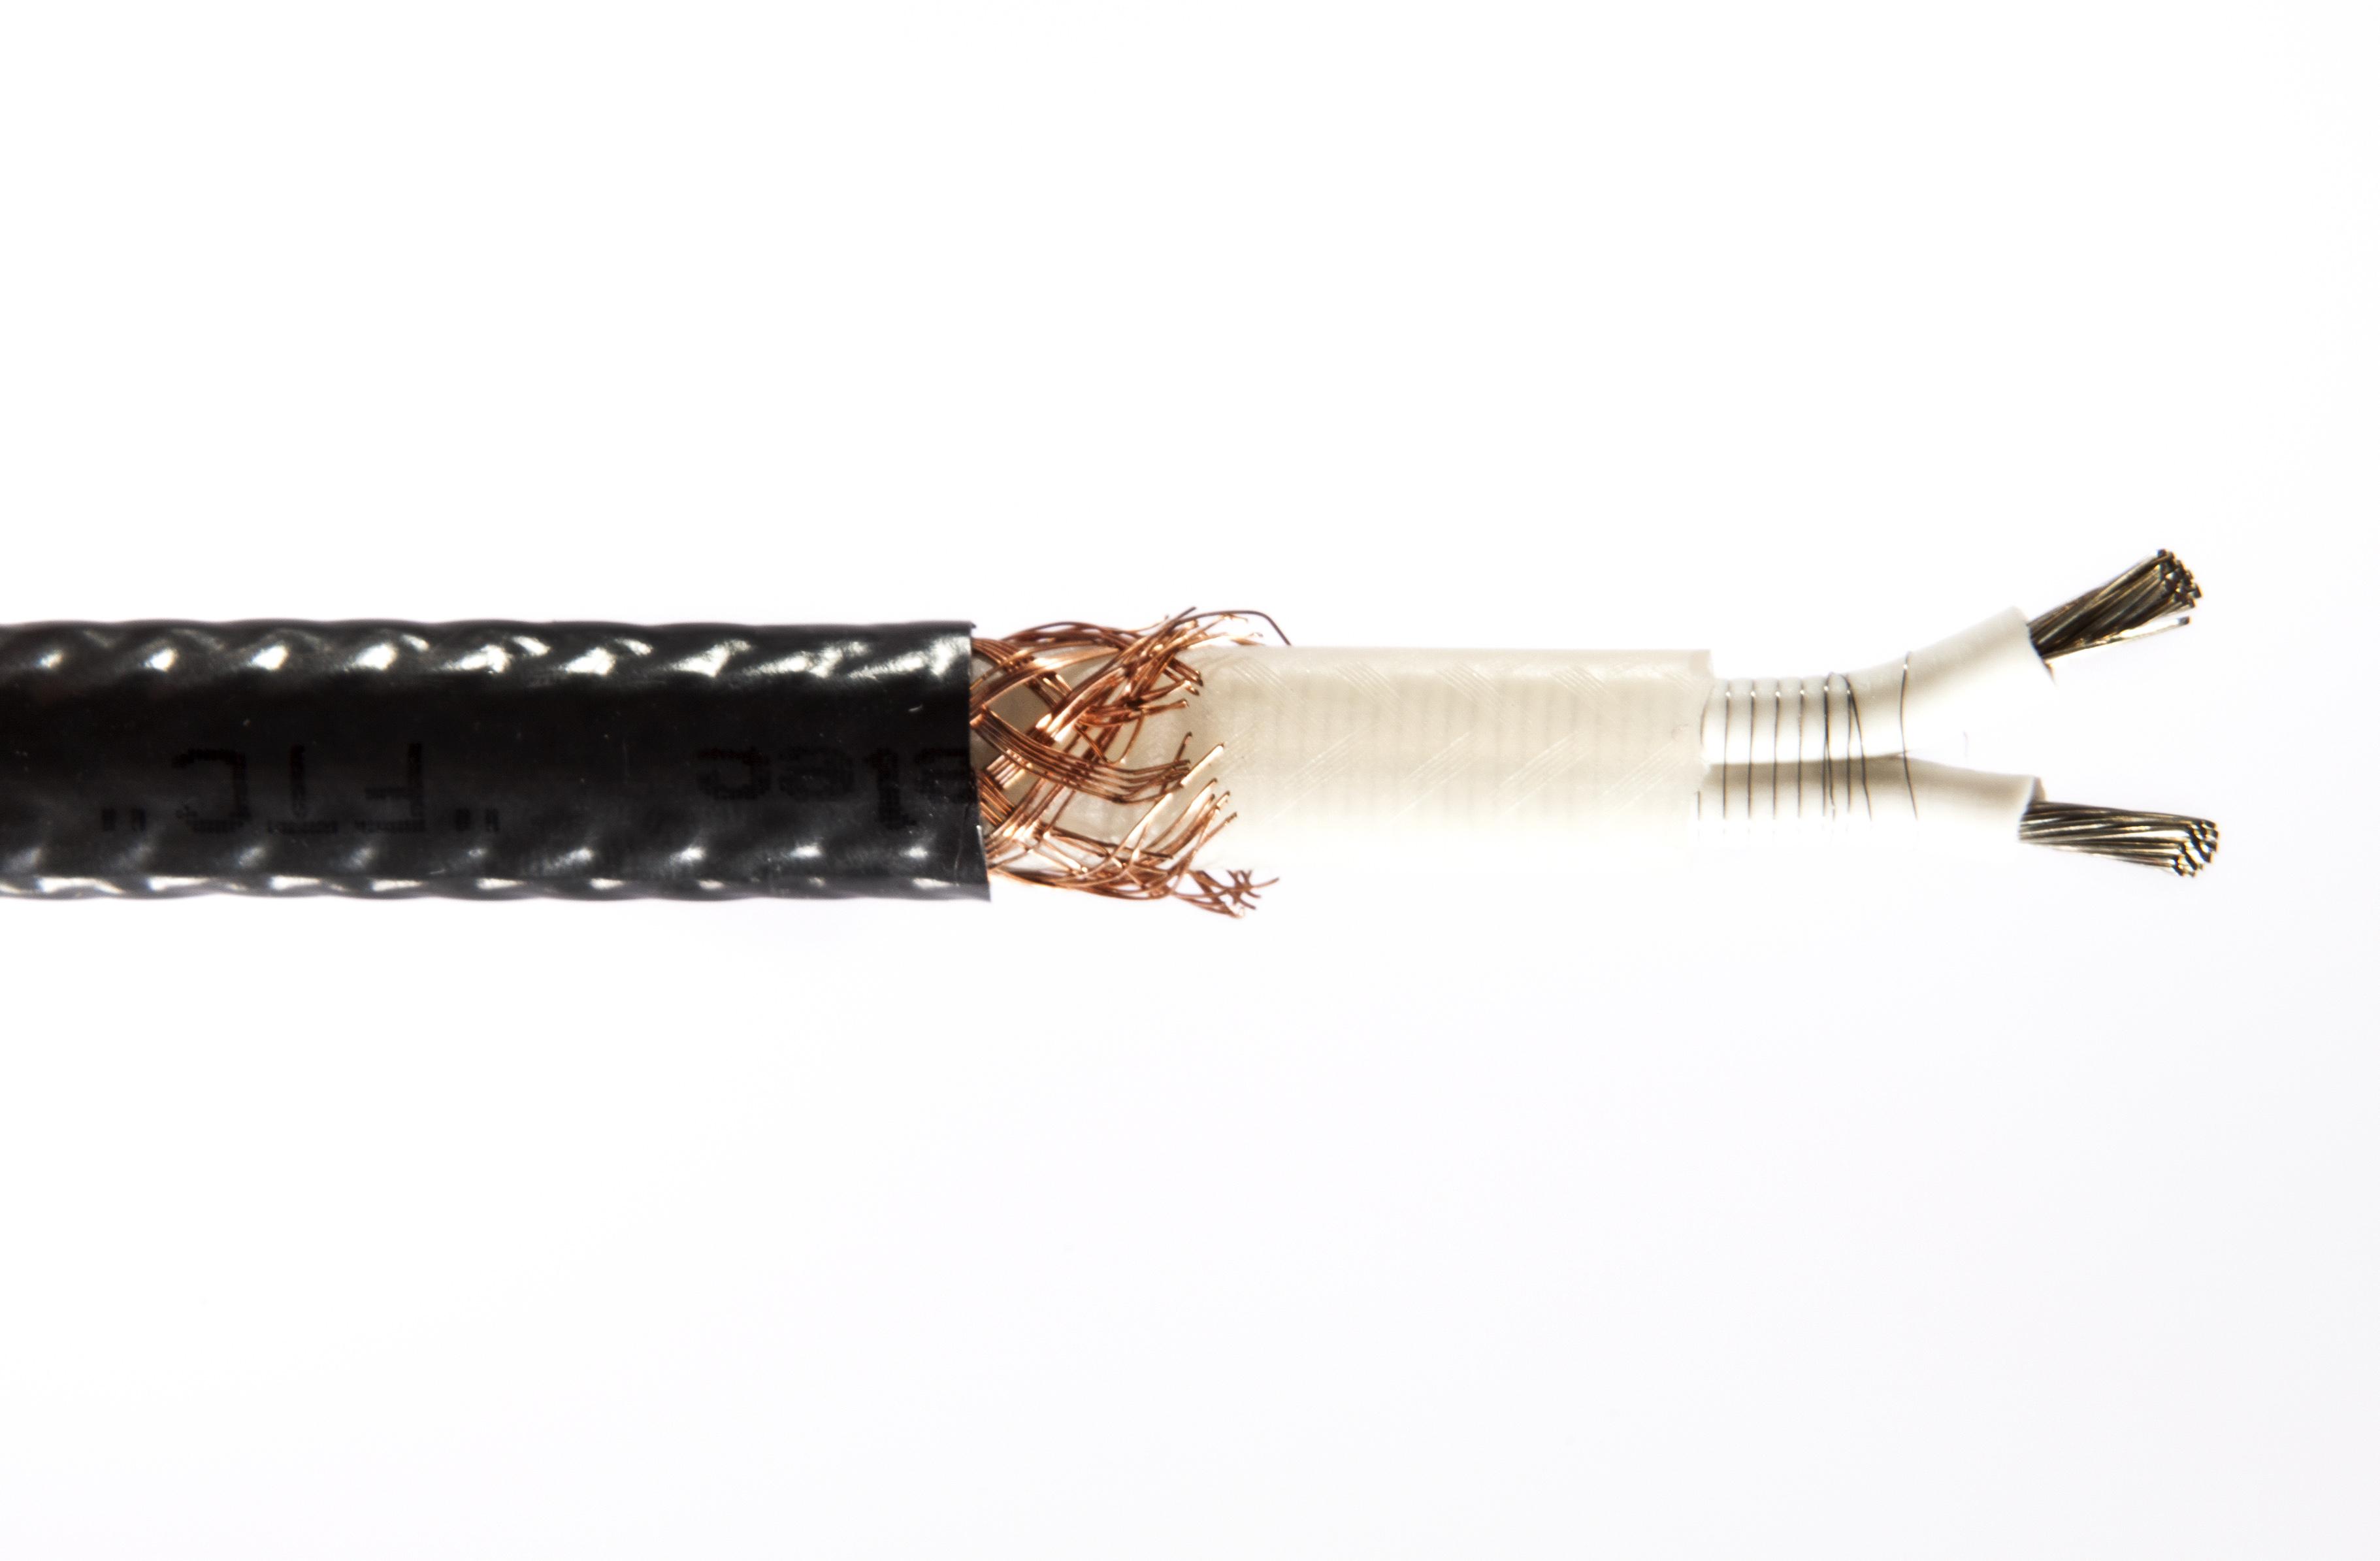 Kaizen kesilebilir sabit güç rezistans kablosu